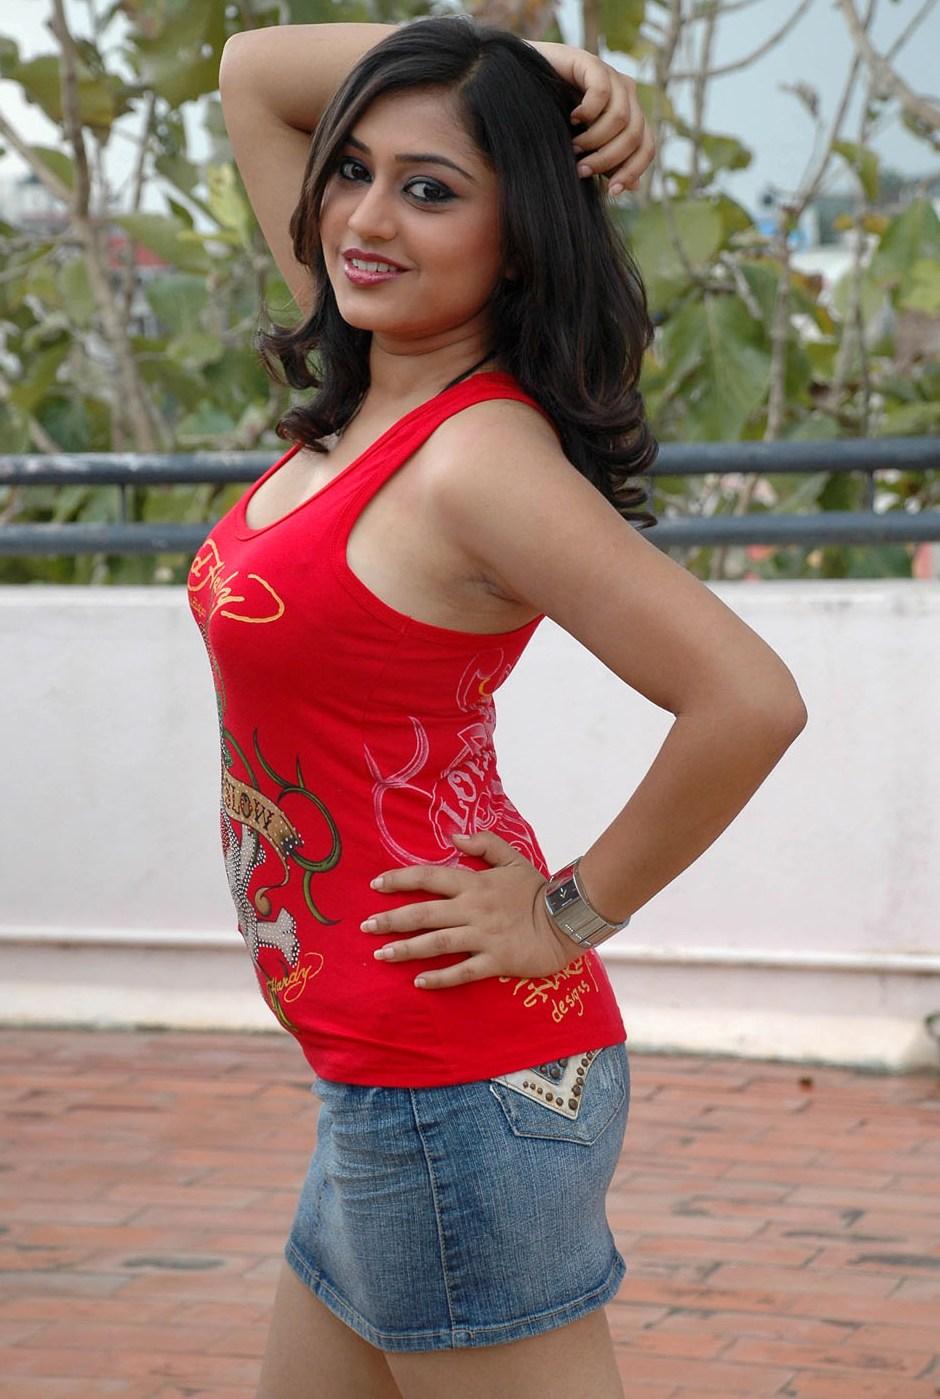 Kannada Nati Ramya Sex Video